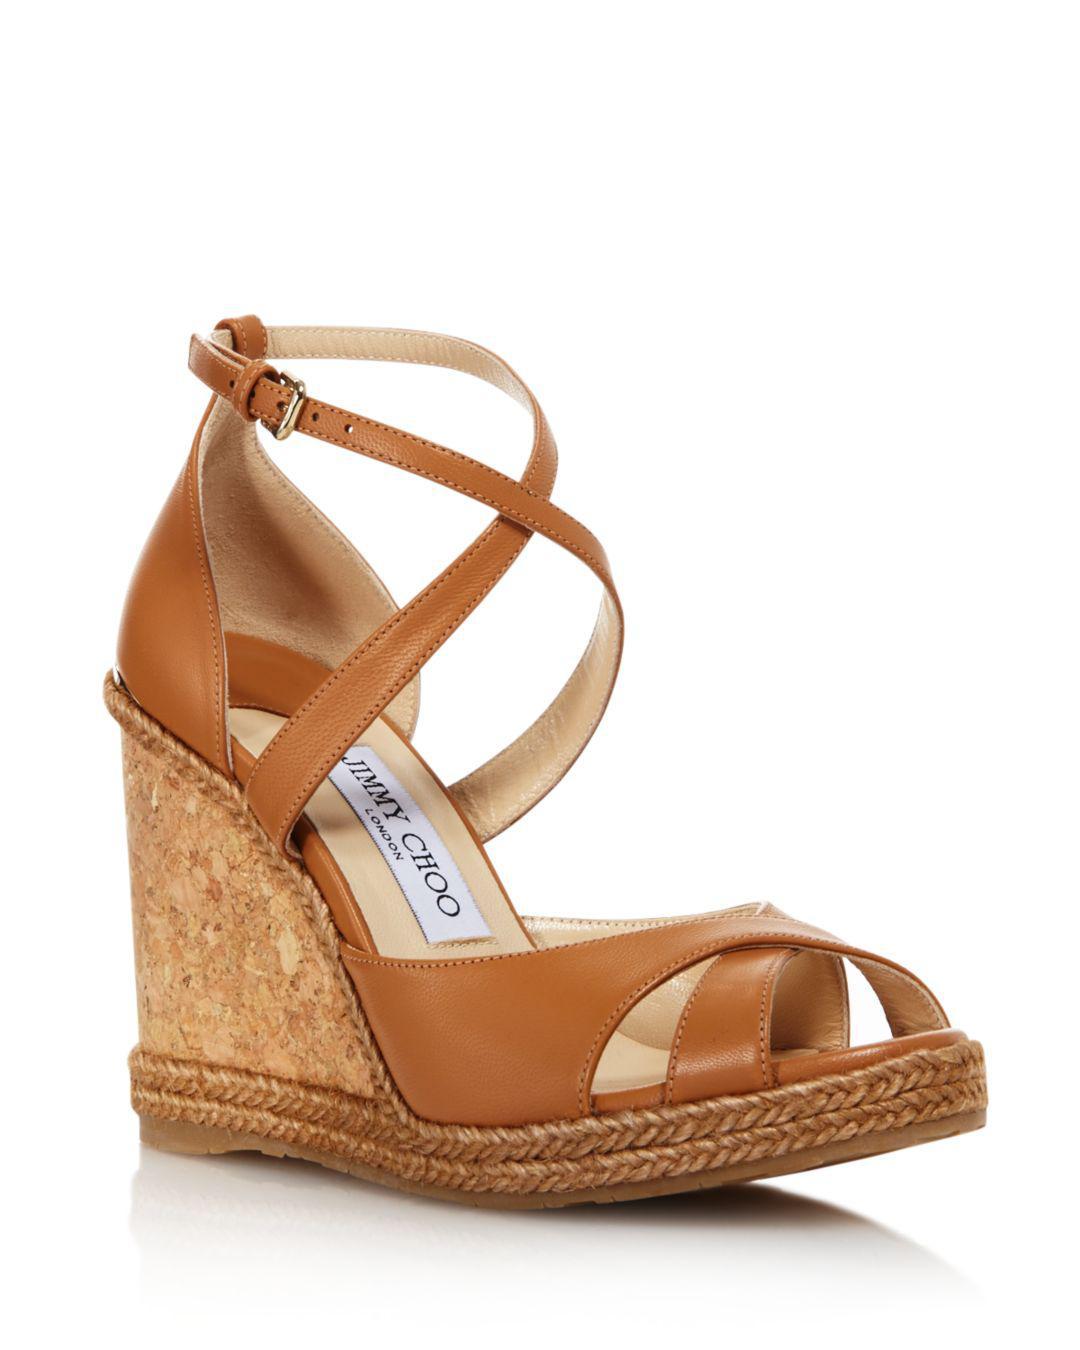 5fa850addb Jimmy Choo Women's Alanah 105 Cork Wedge Heel Sandals in Brown - Lyst